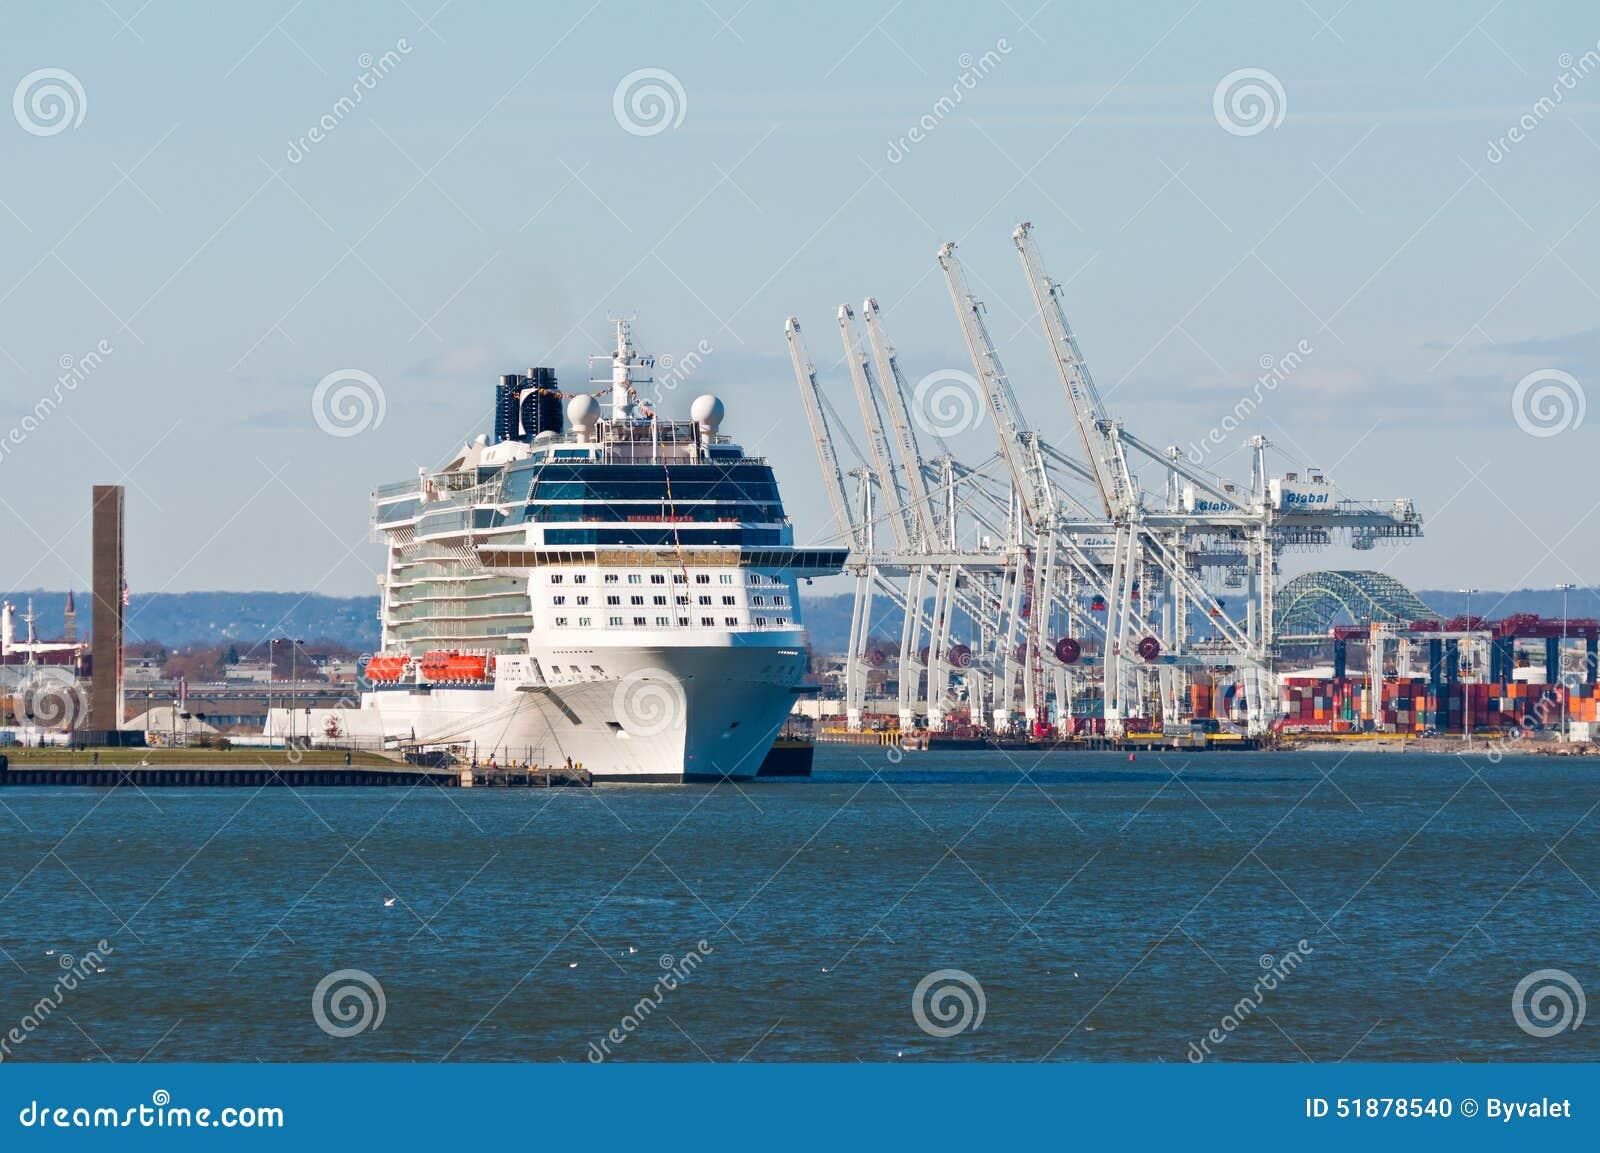 Cruises From New York - NYC Cruises | CruisesOnly